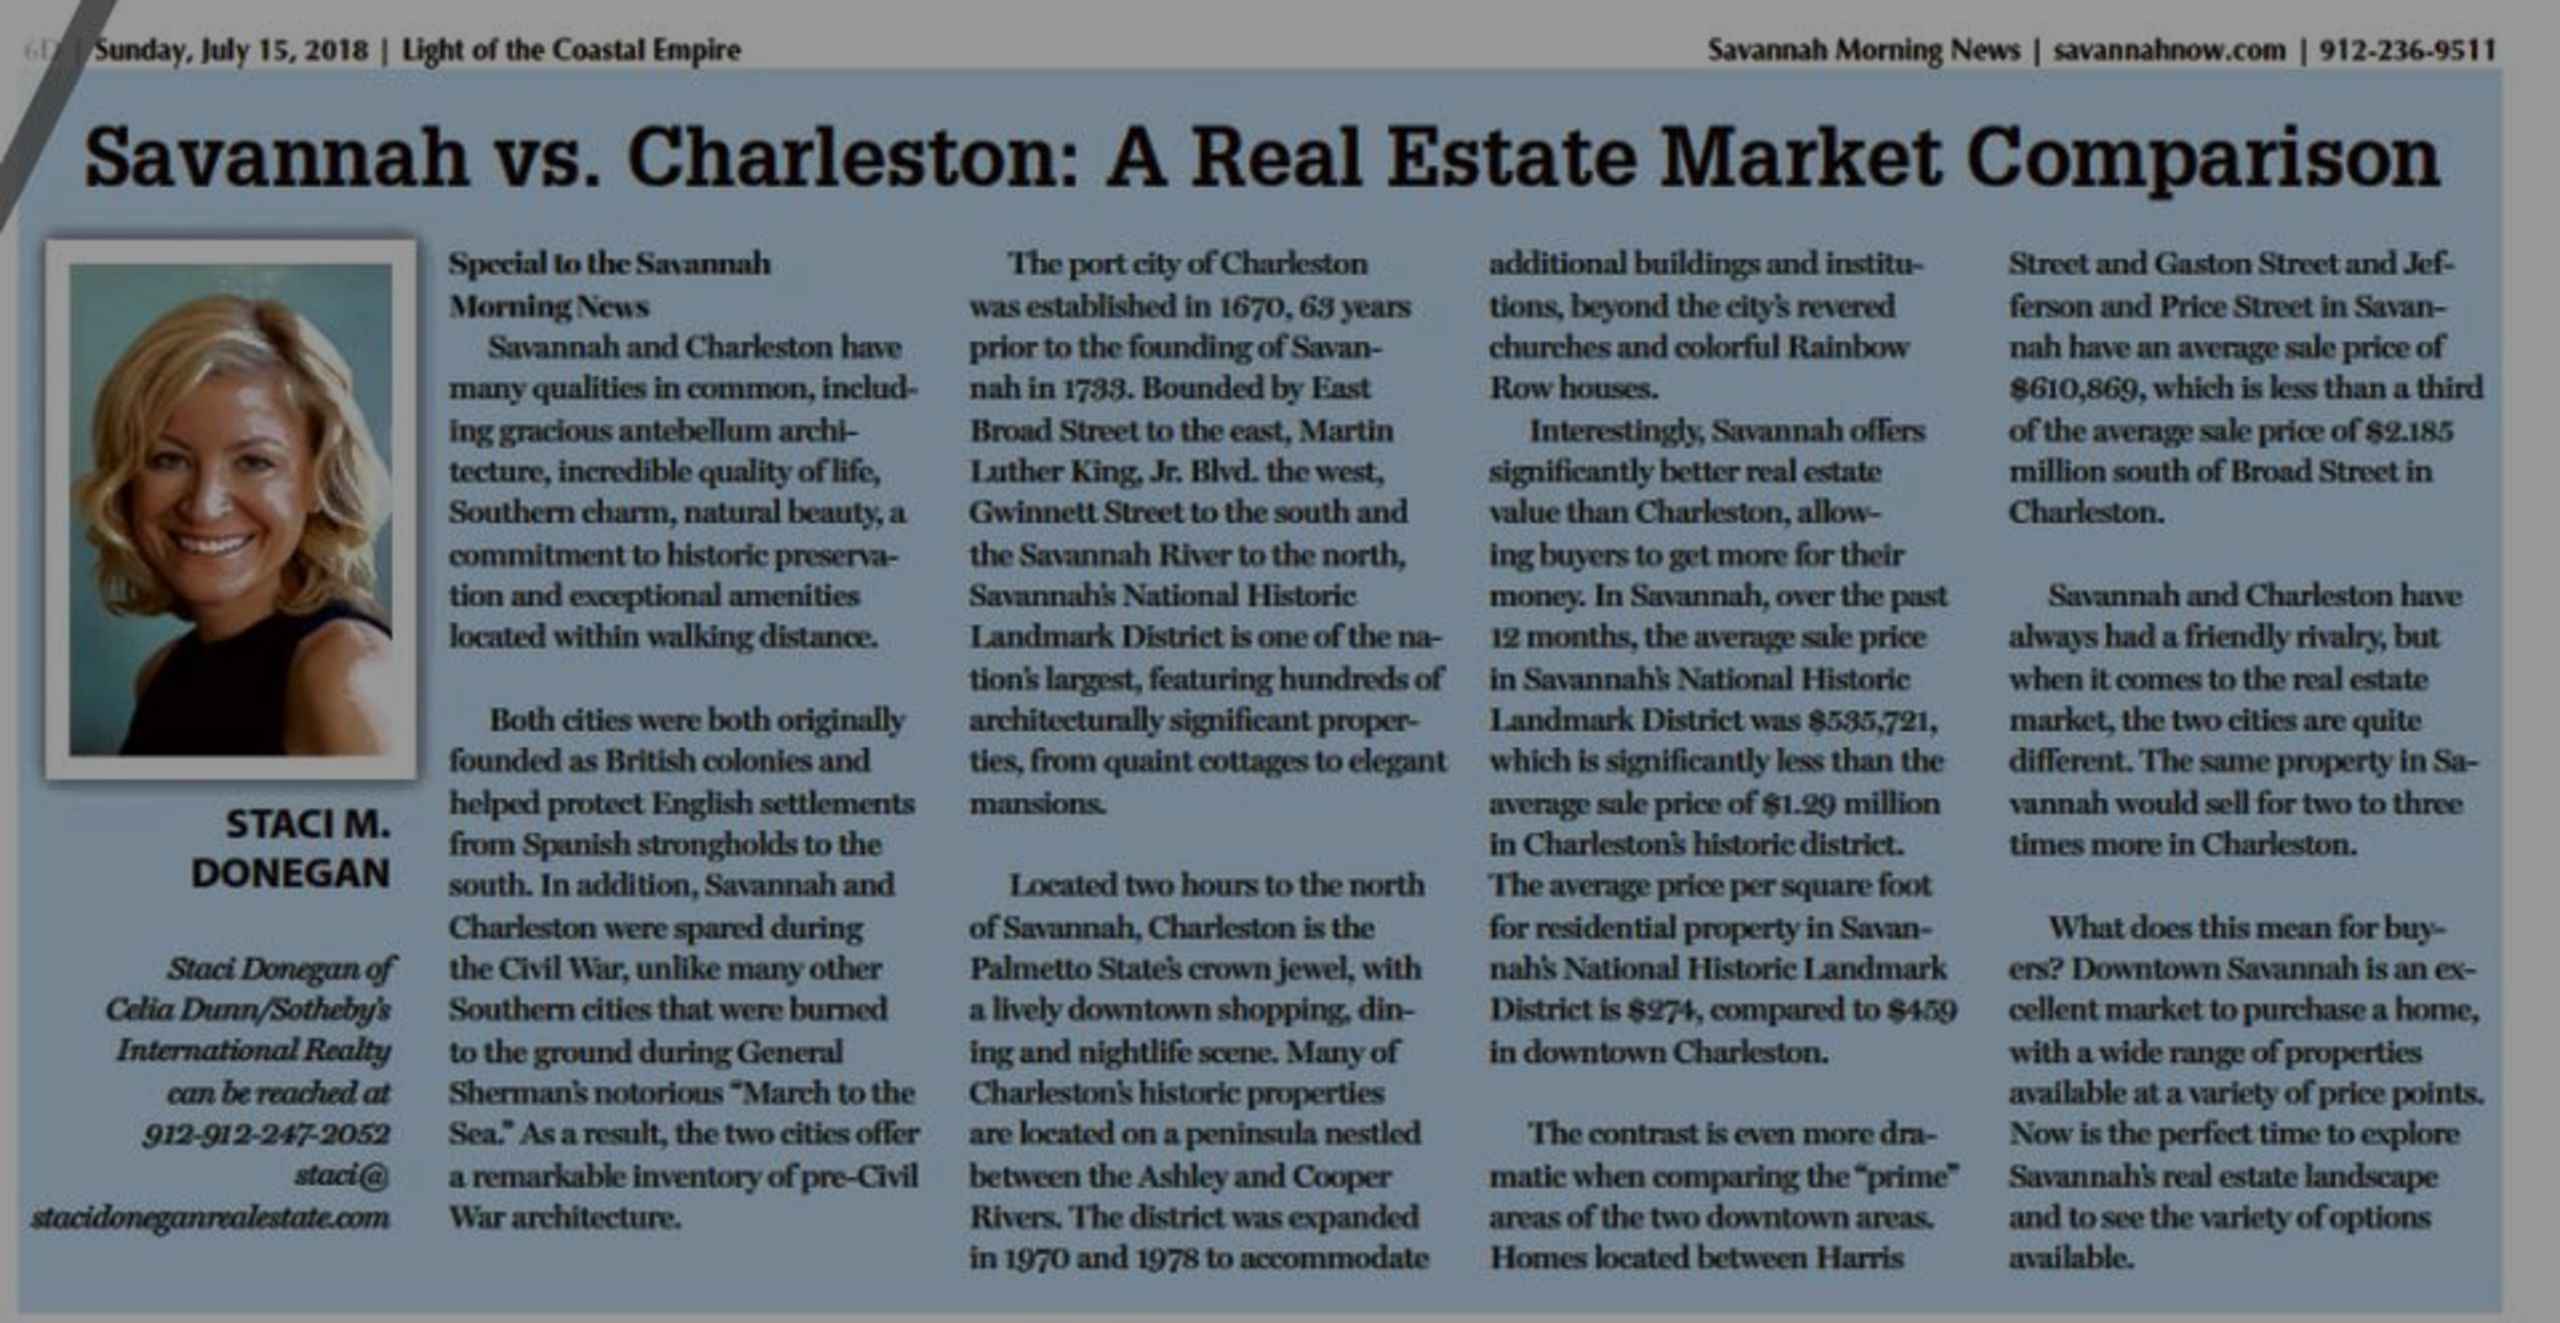 Savannah vs. Charleston: A Real Estate Market Comparison